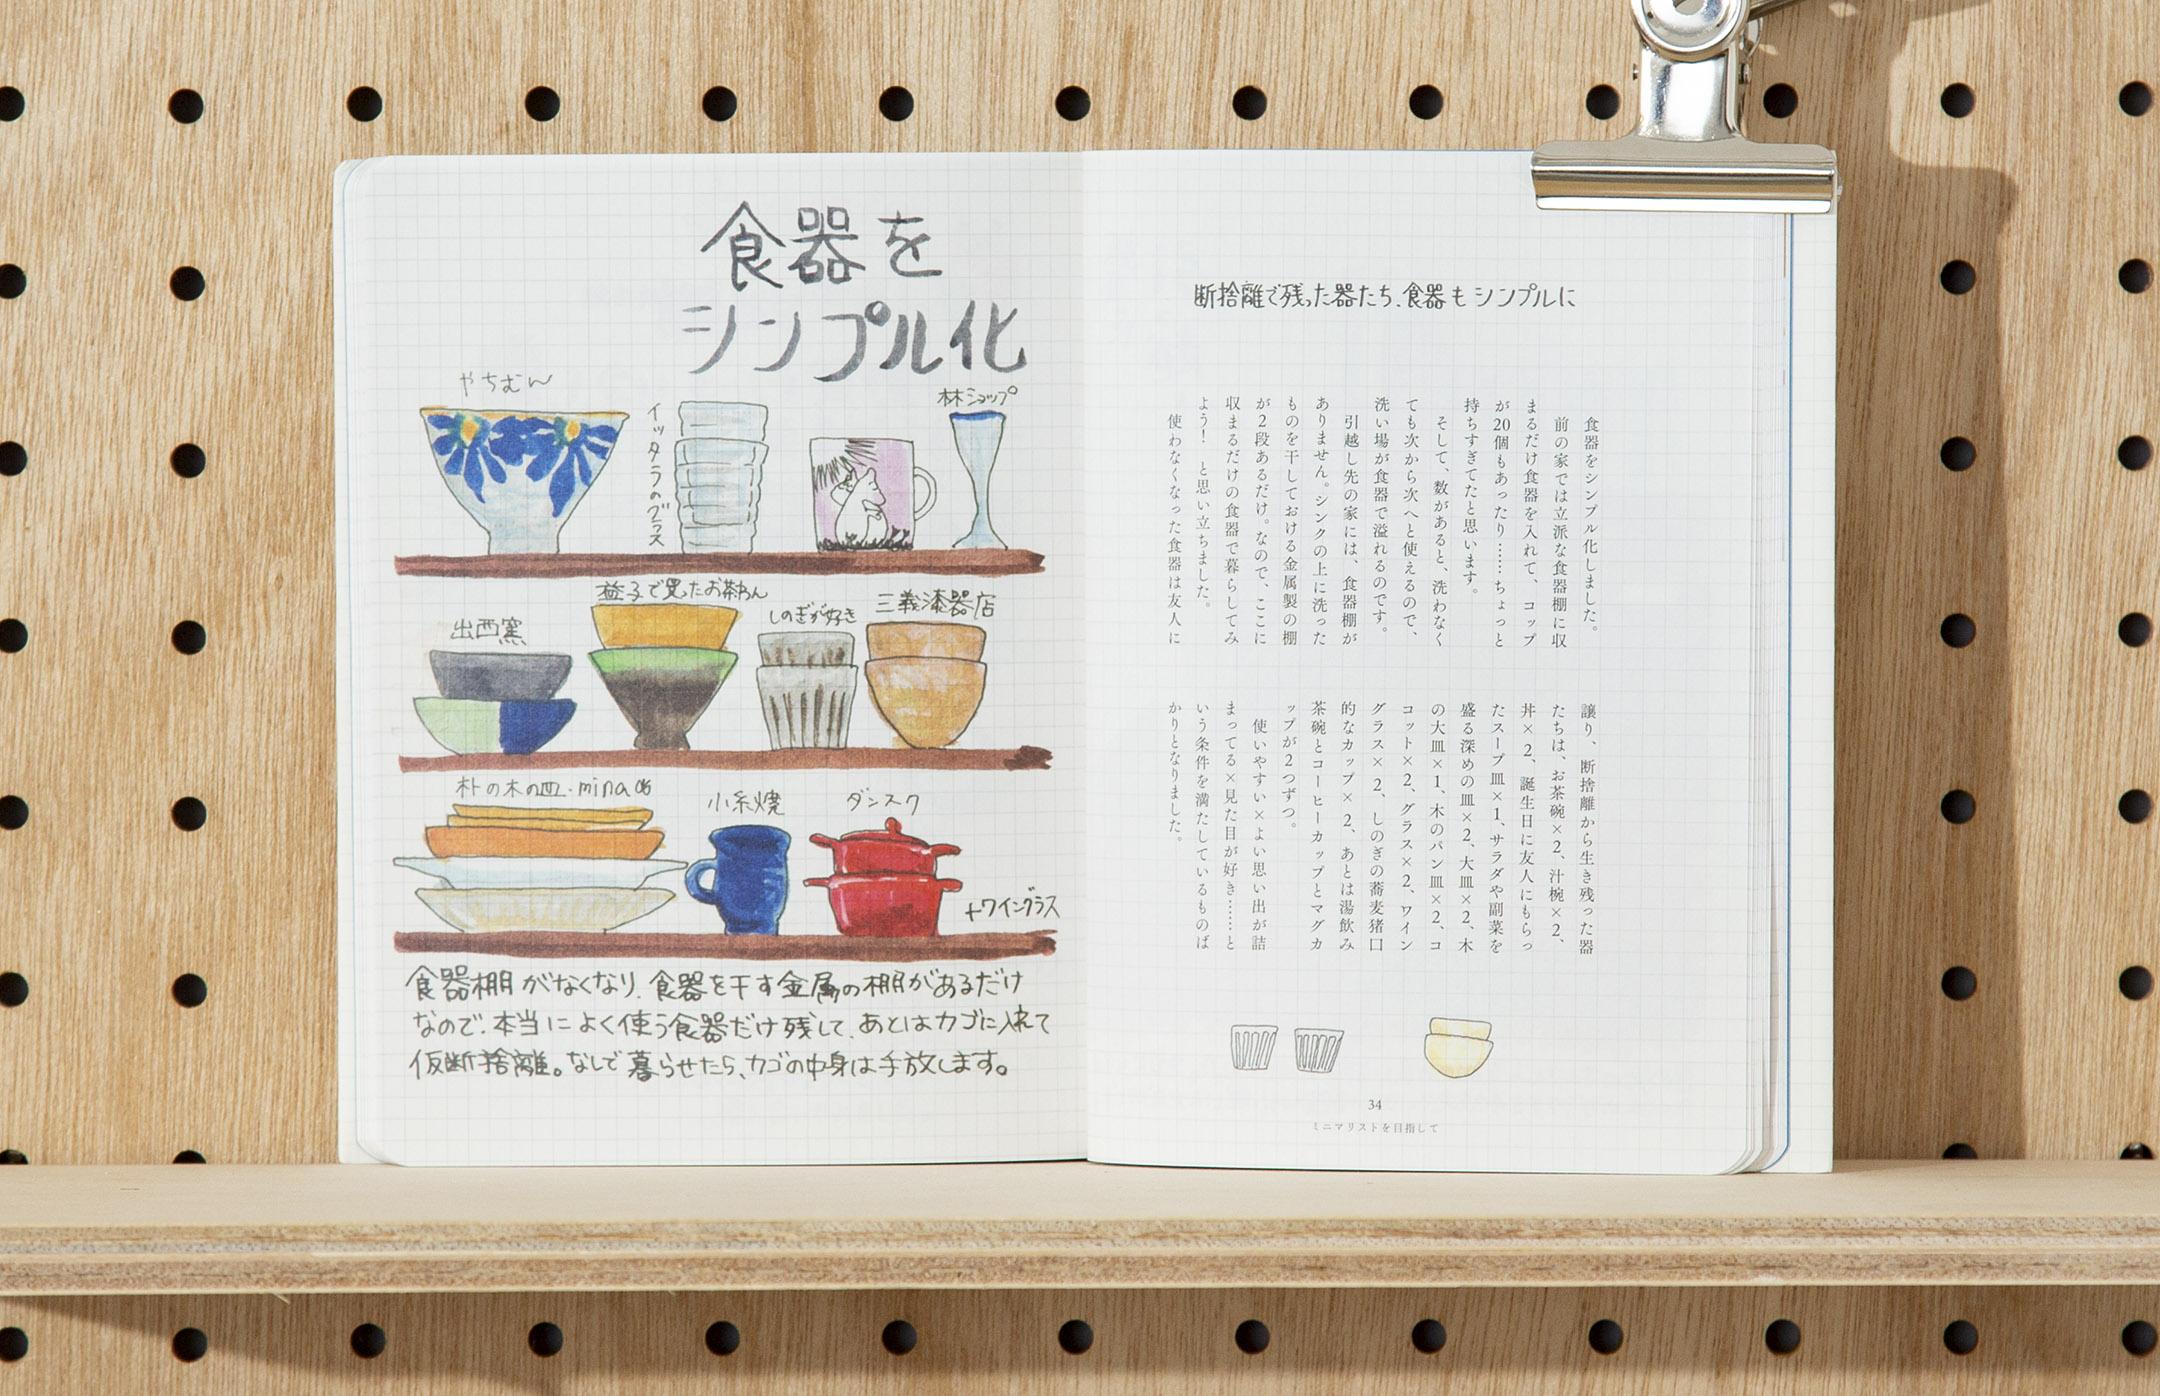 soda design ミニマリスト日和 おふみ